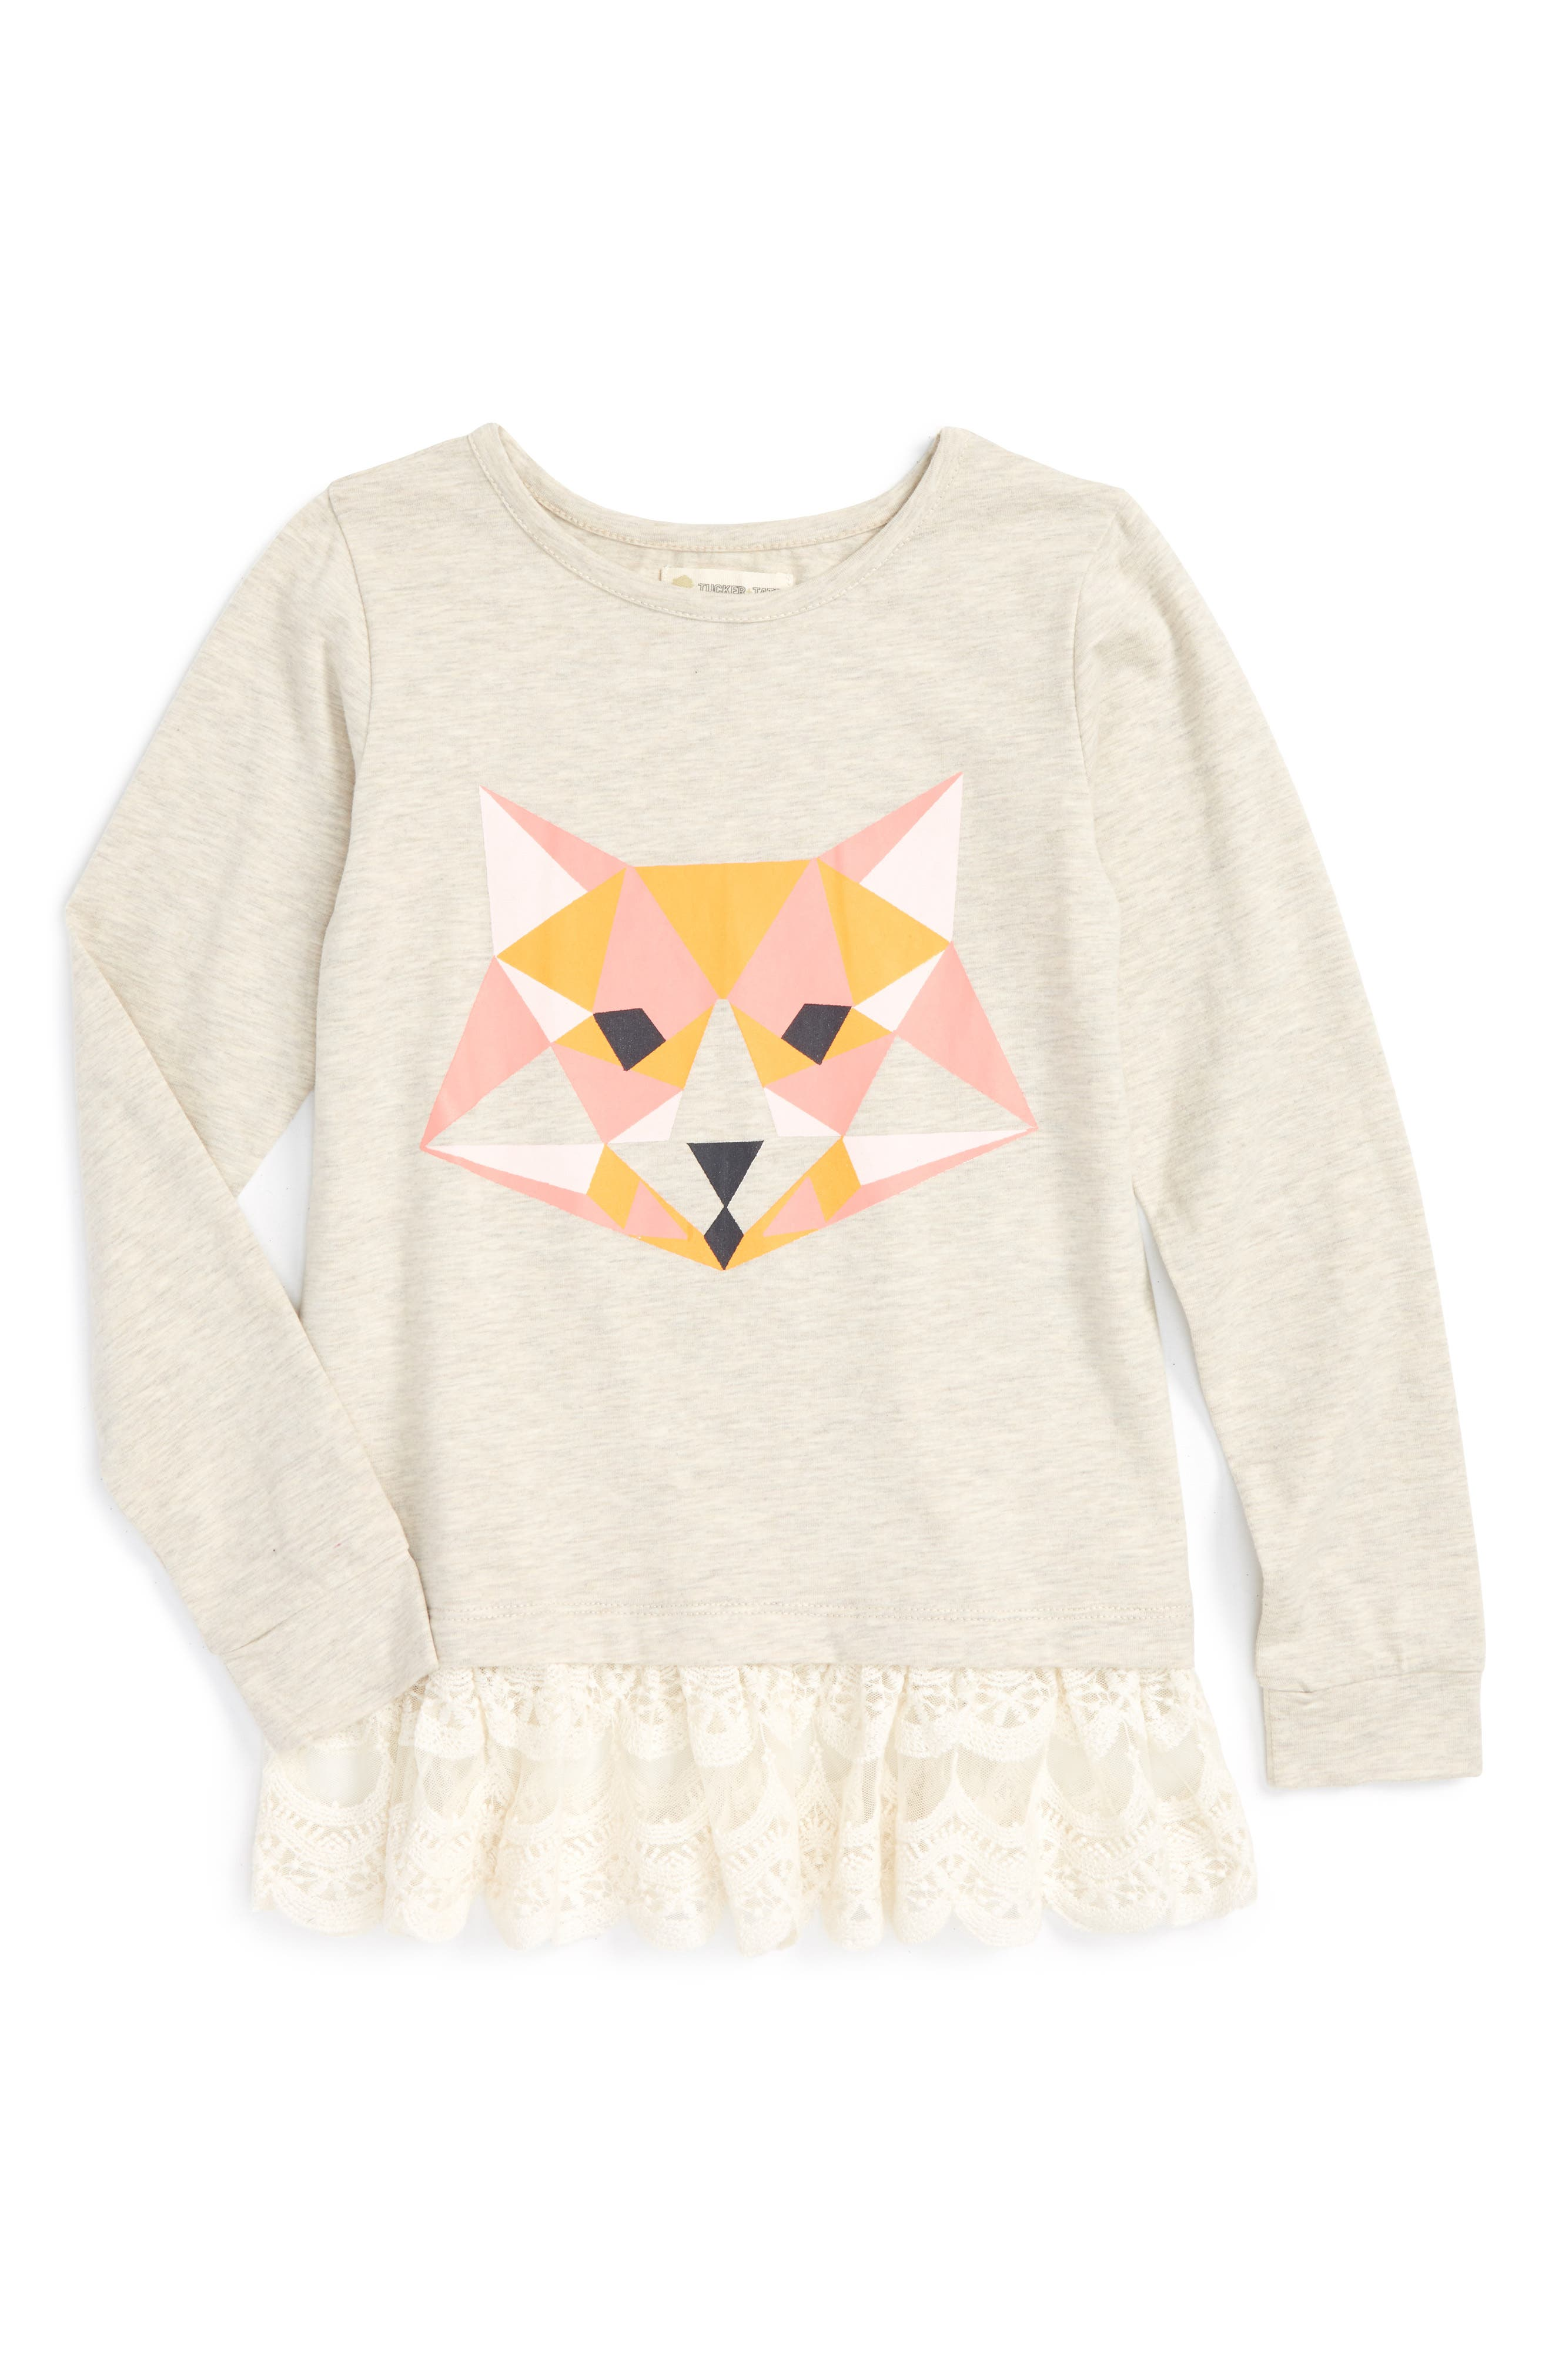 Alternate Image 1 Selected - Tucker + Tate 'Britton' Graphic Lace Hem Tunic (Toddler Girls, Little Girls & Big Girls)